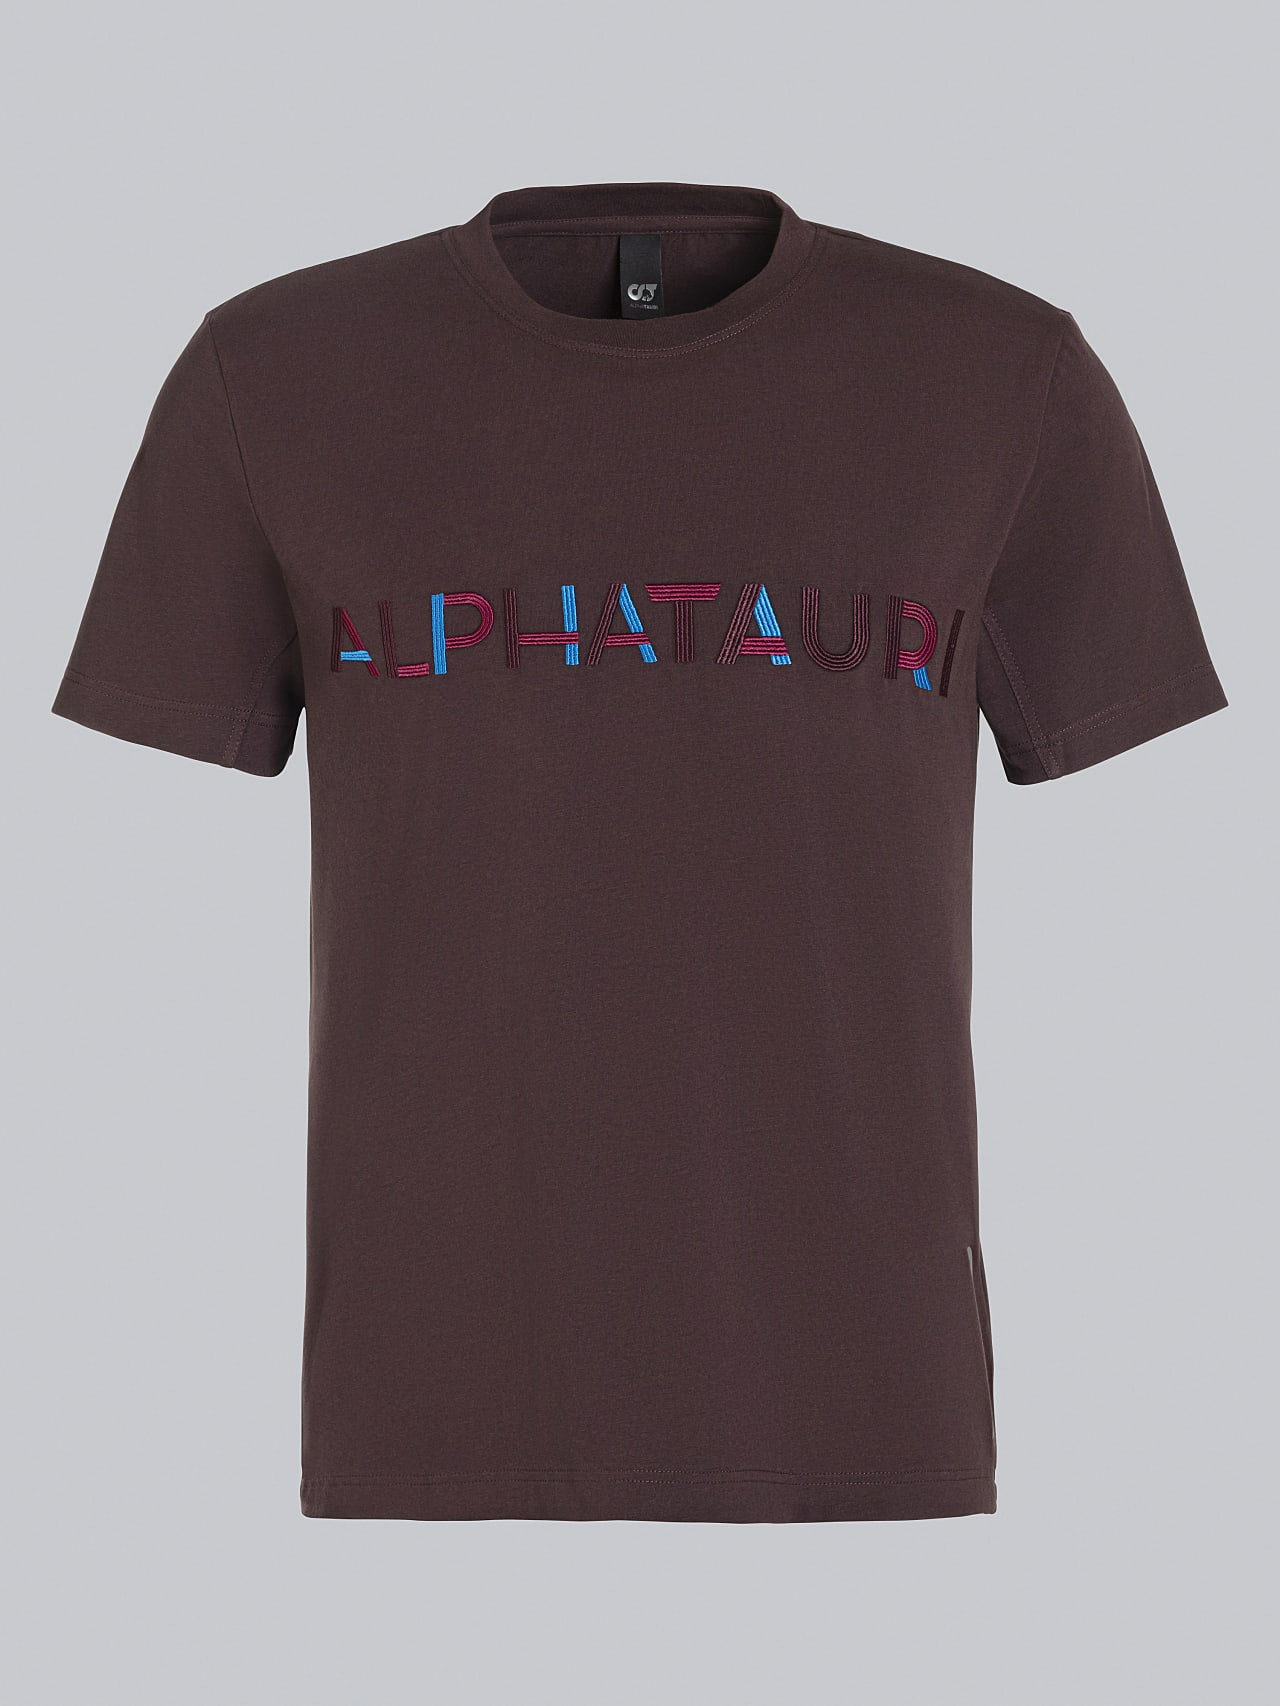 JANOS V3.Y5.02 Logo Embroidery T-Shirt Burgundy Back Alpha Tauri